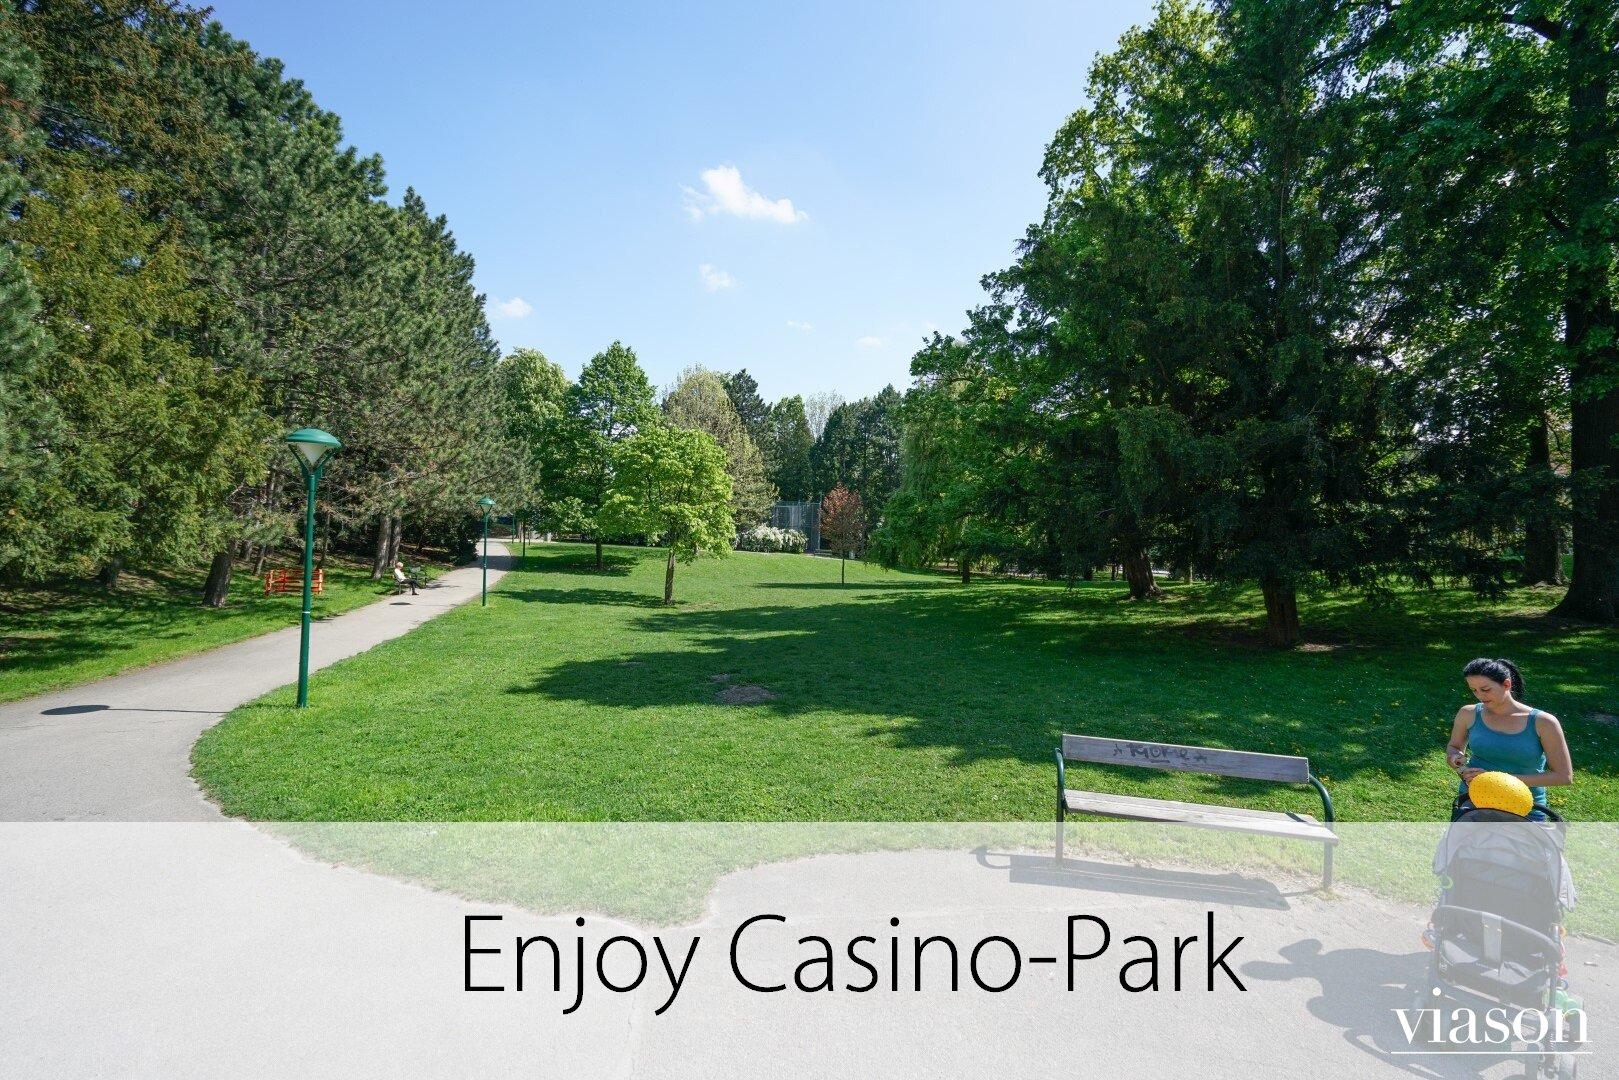 Nahe Casinopark